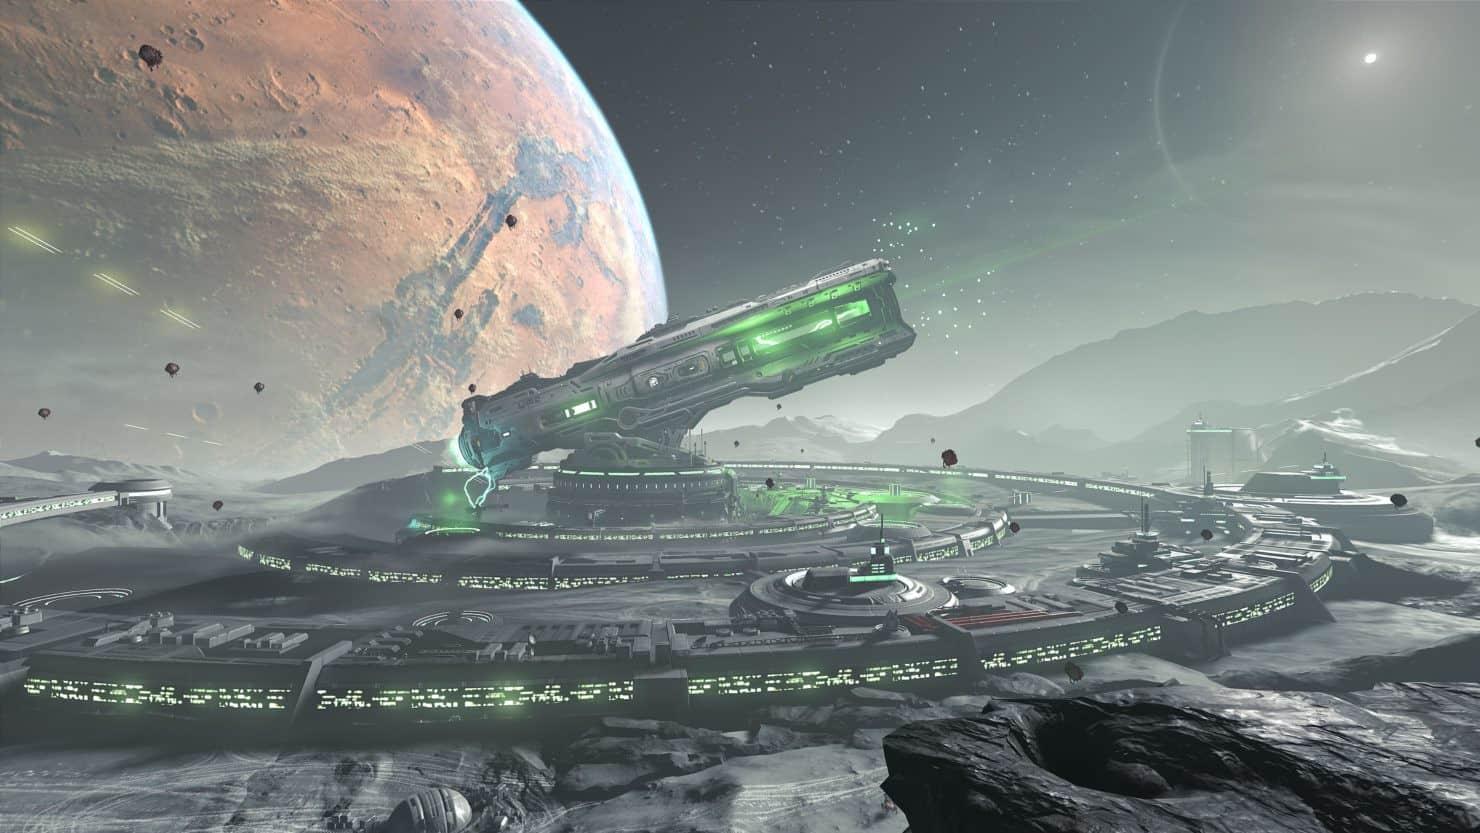 doom eternal 2 - DOOM Eternal - Primi dettagli, Immagini e gameplay